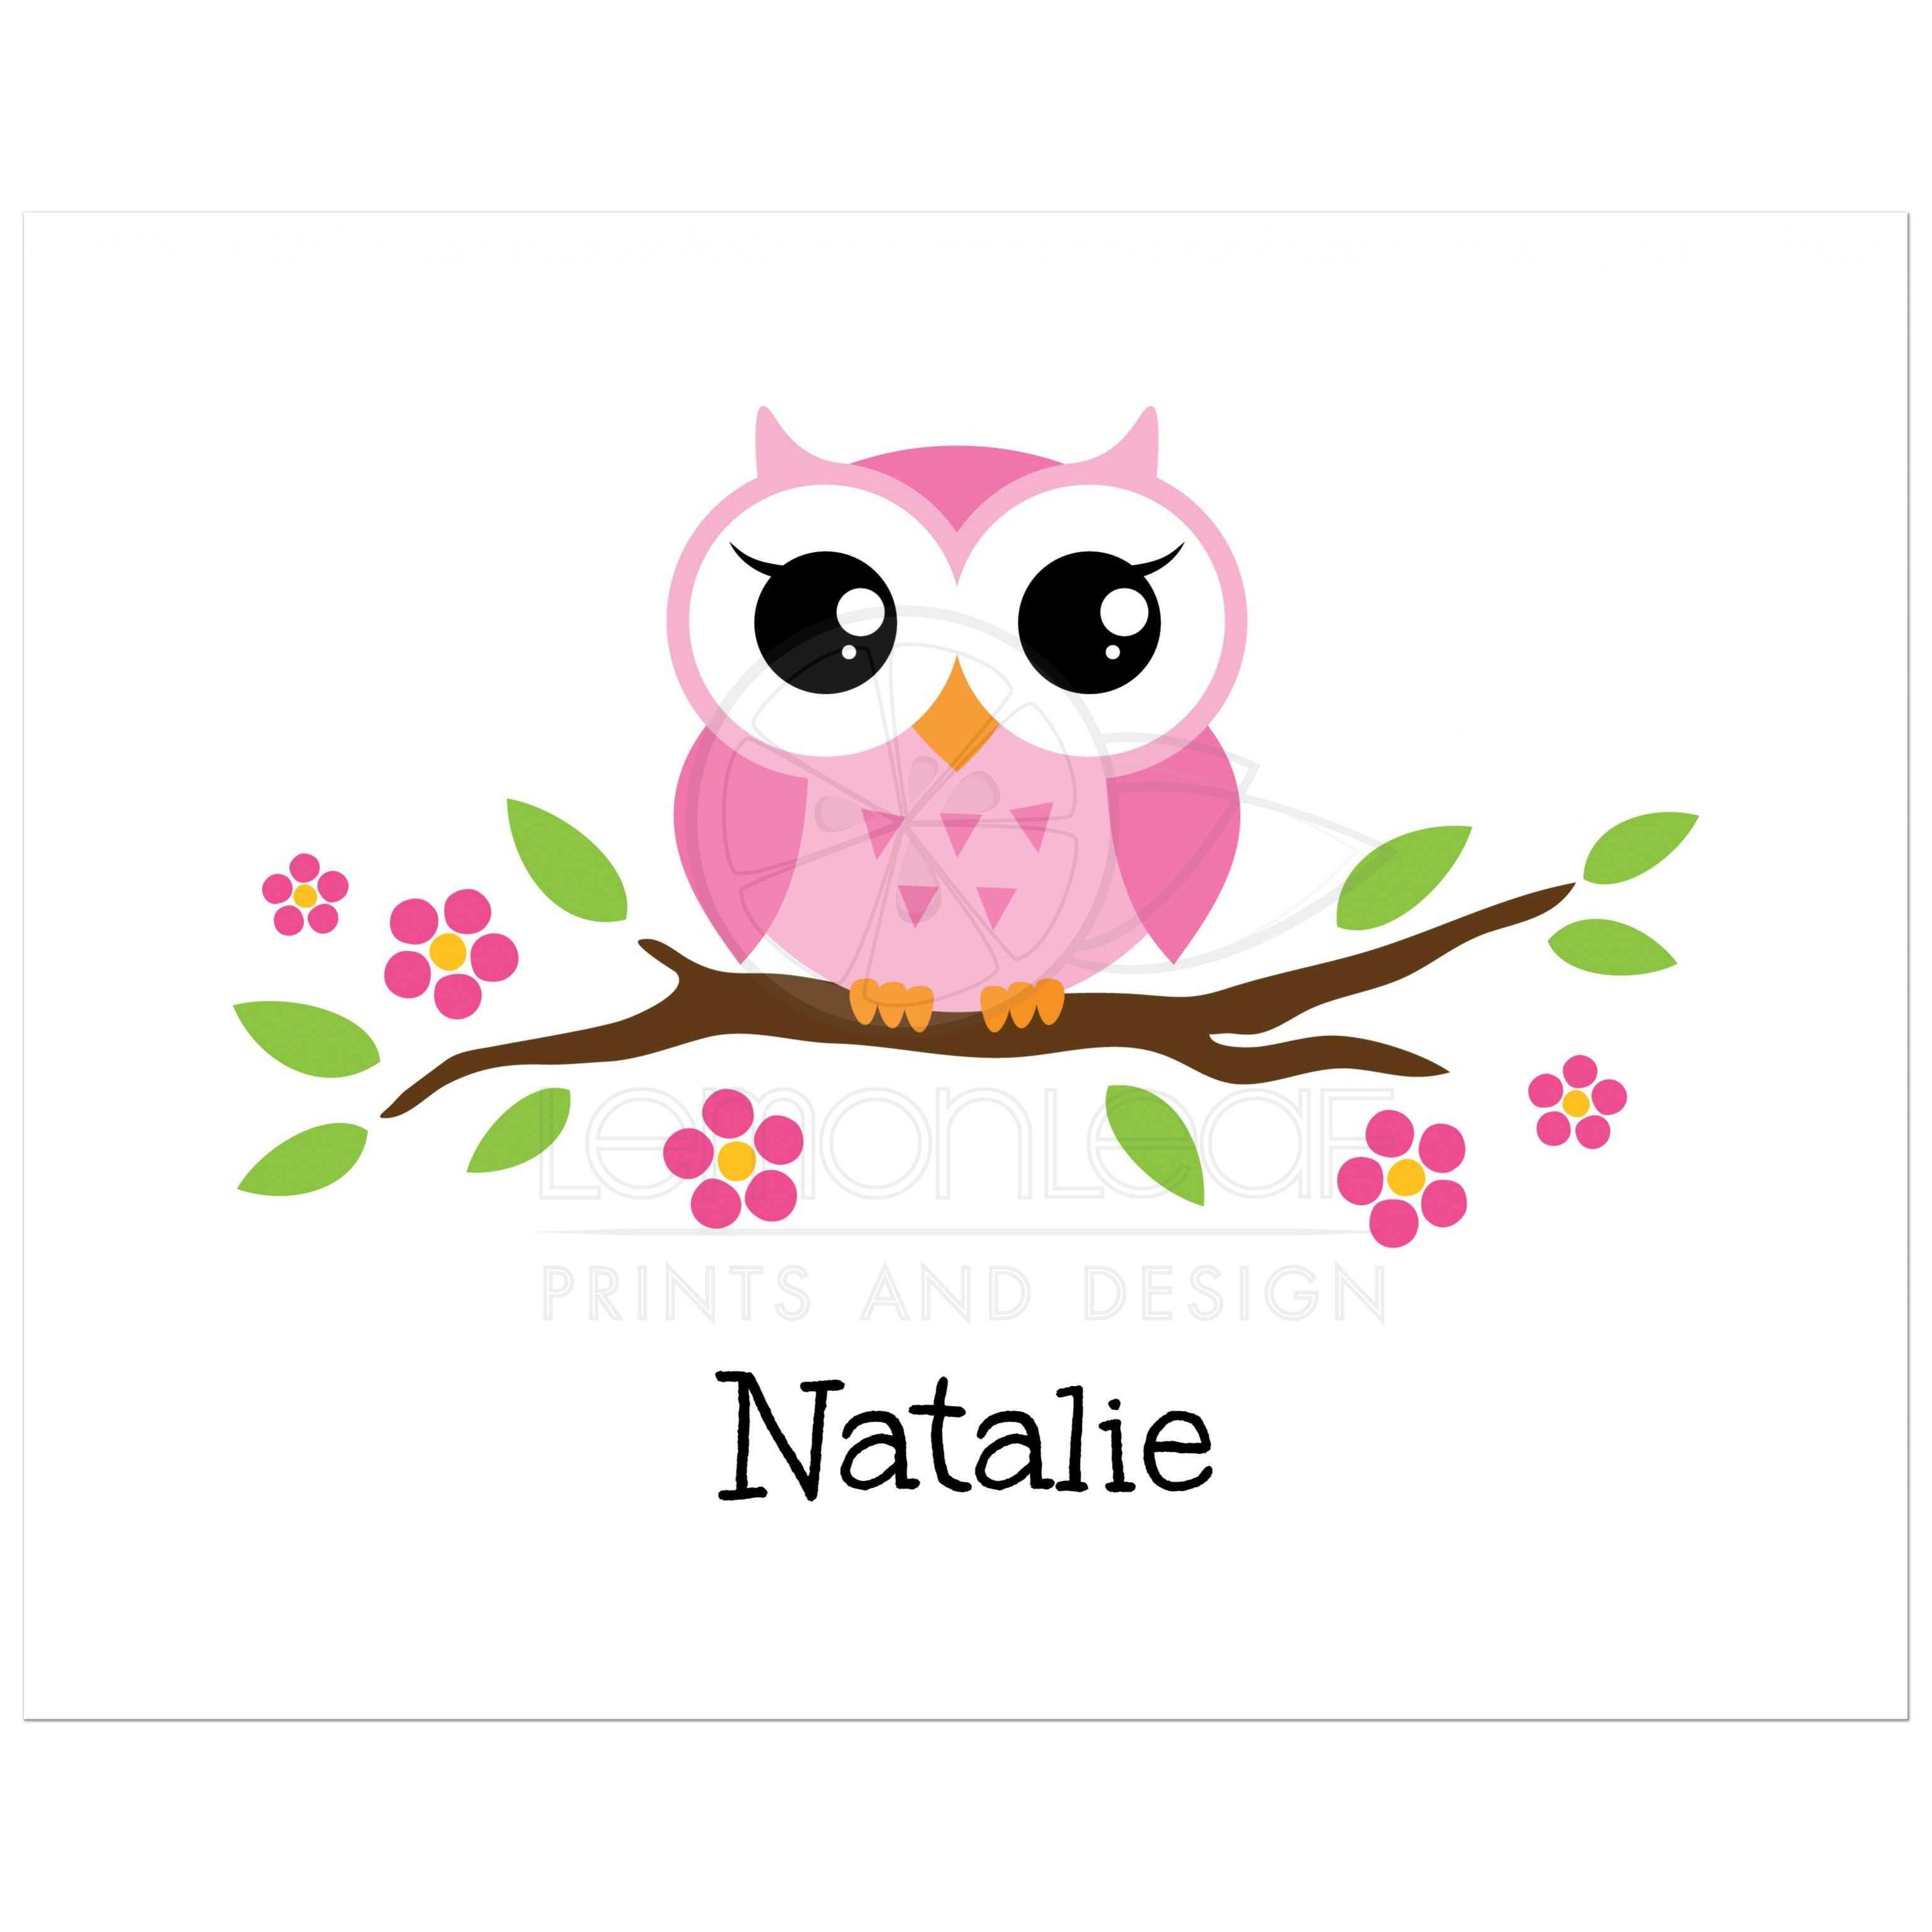 OWL CUTE OWL PERSONALISED NAME CHILDRENS OR ADULT BIRTHDAY BADGE